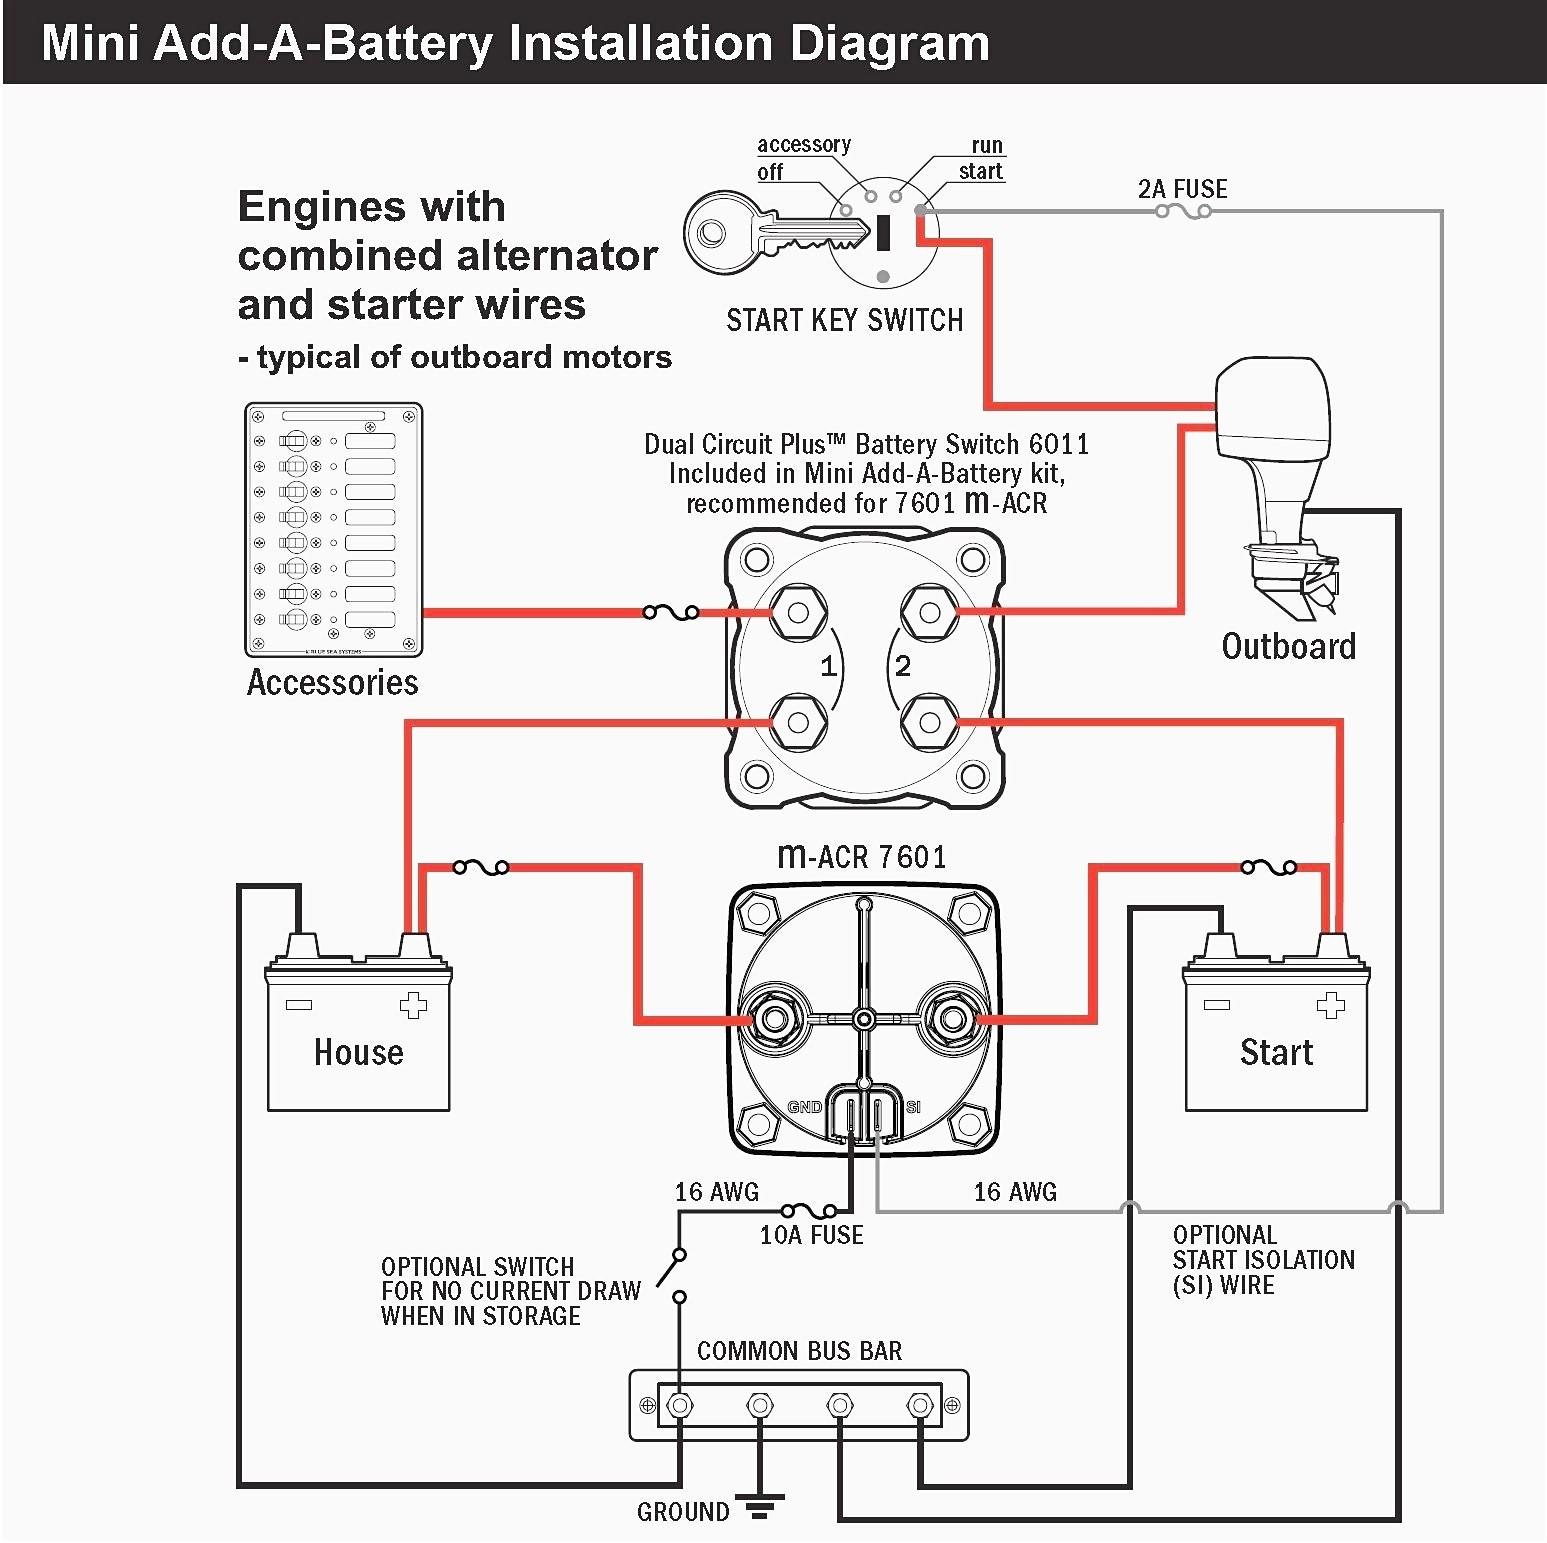 hight resolution of rv starter wiring diagram wiring diagram centre rv battery disconnect switch wiring diagram free wiring diagramrv